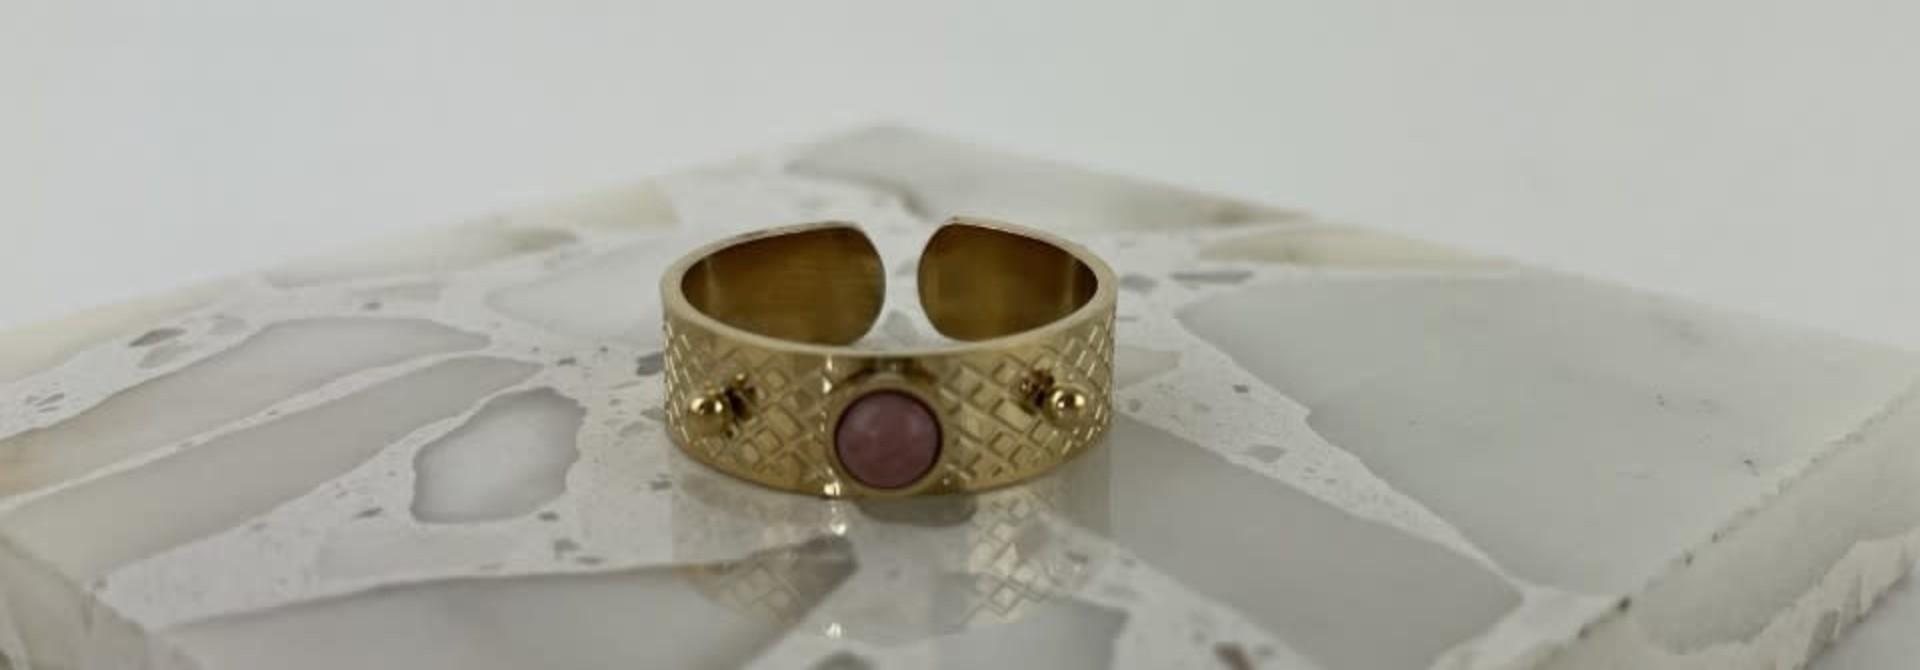 Ayara inscribed ring Violet